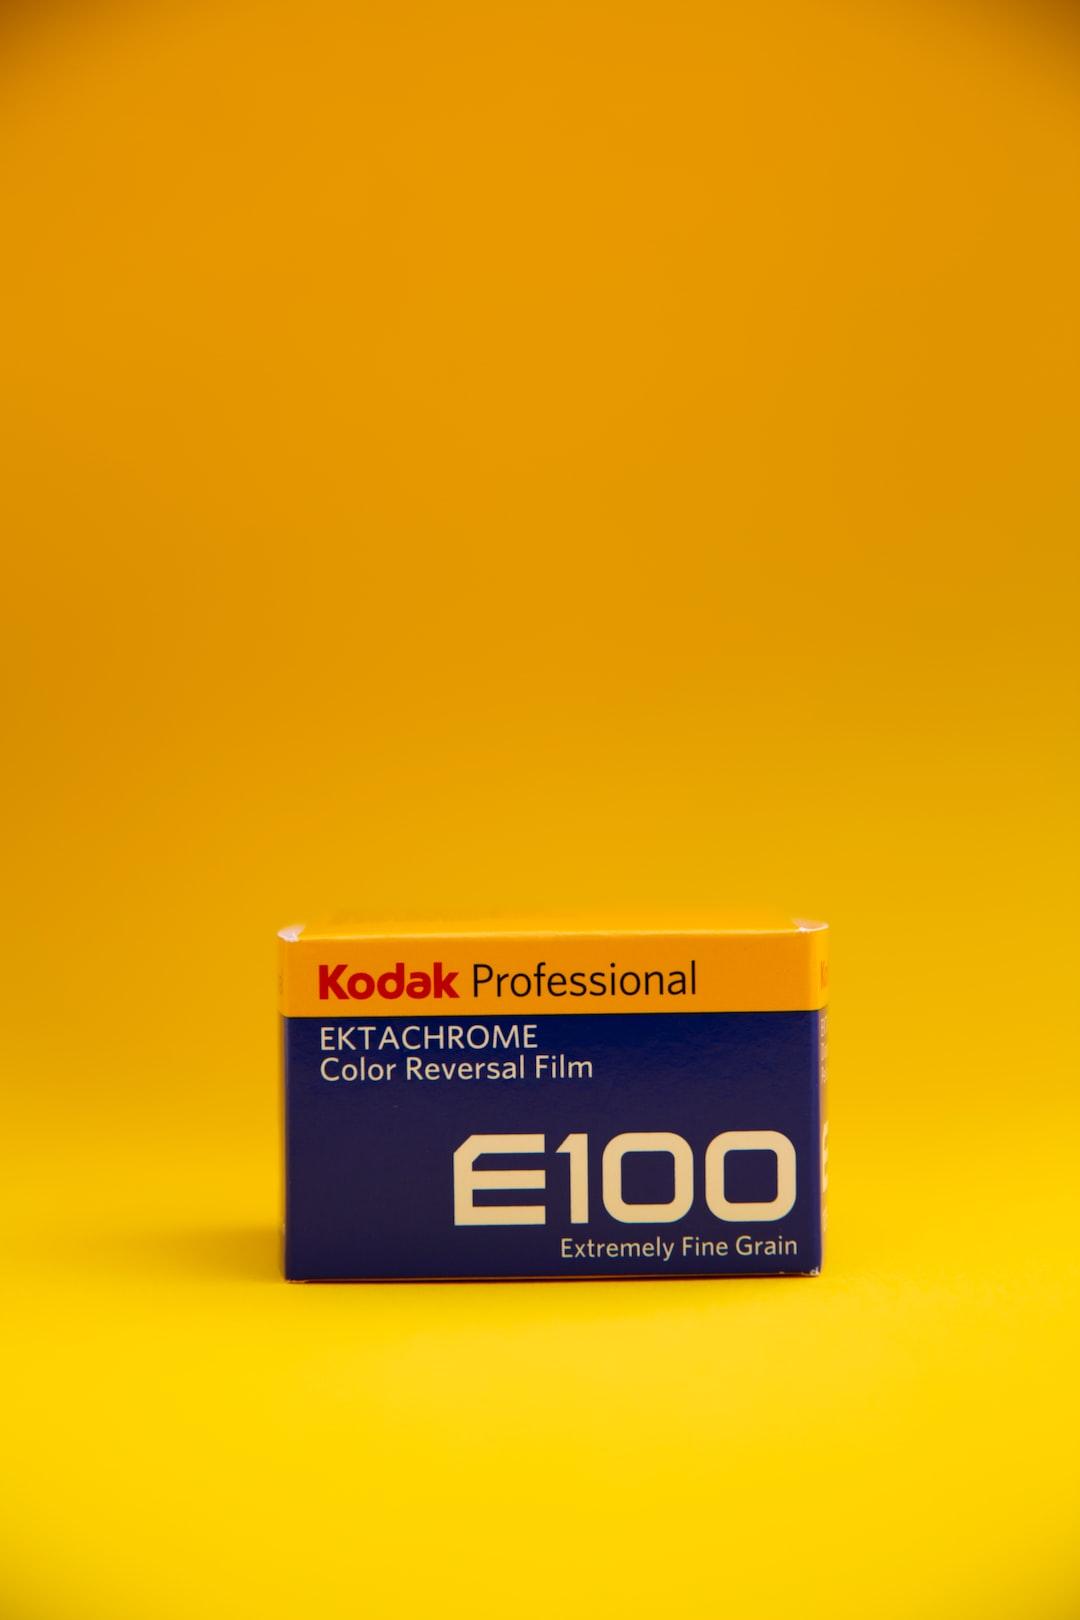 Kodak Professional EKTARCHROME E100 Analog Film Reel.